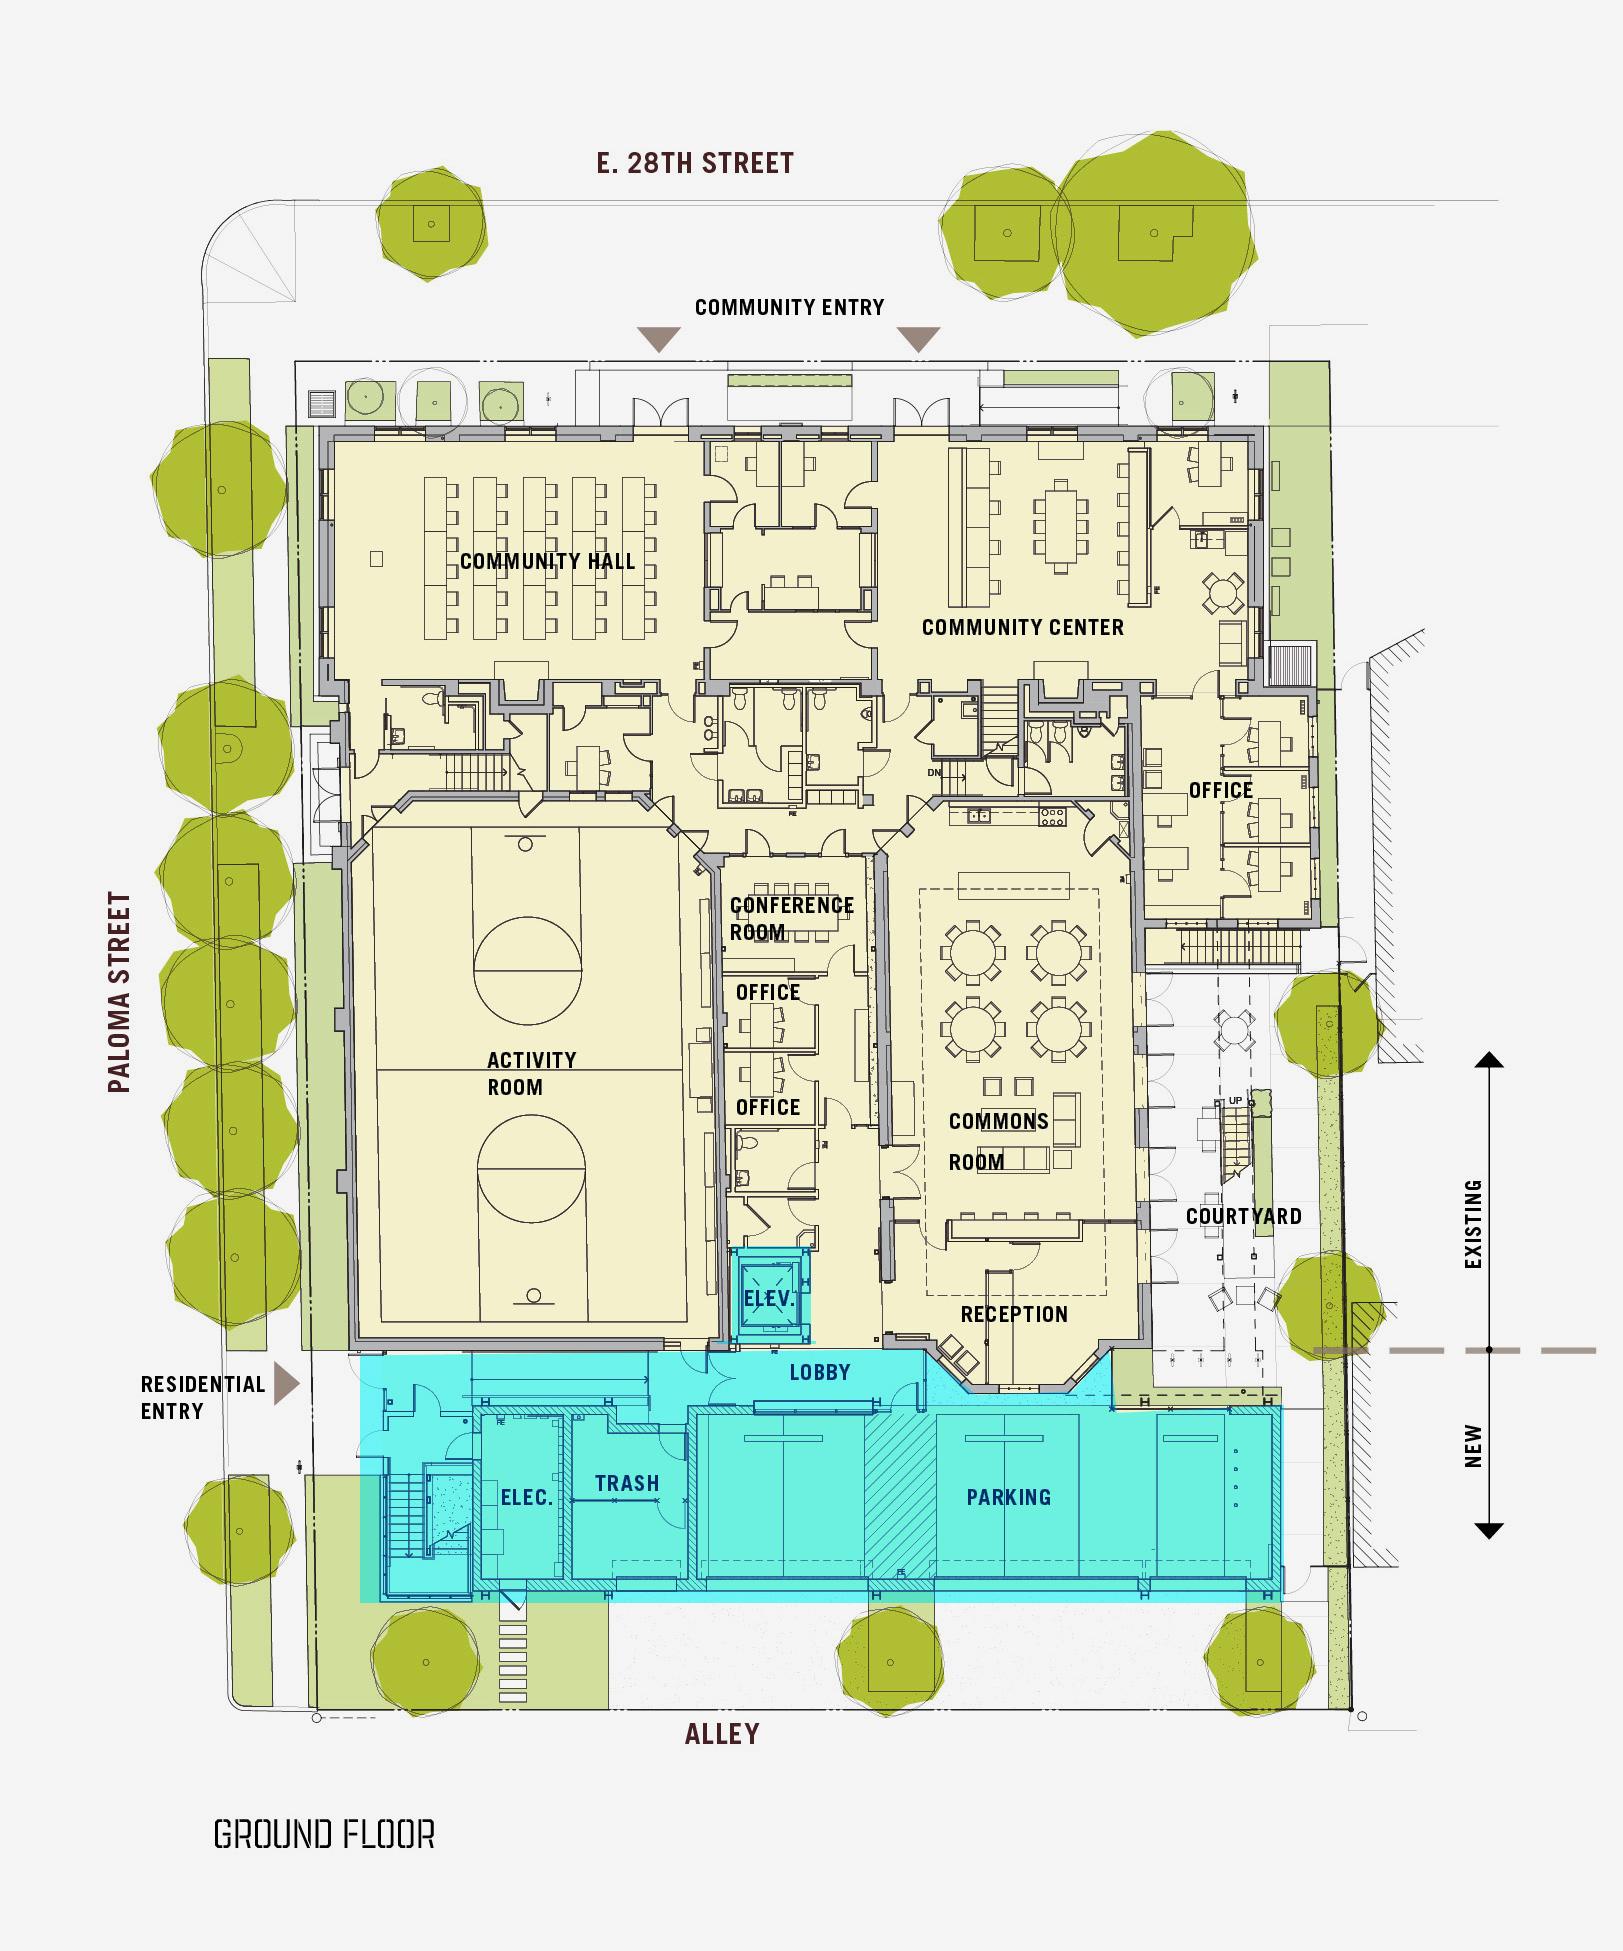 28th Street Apartments - Ground Floor Plan - KEA.jpg